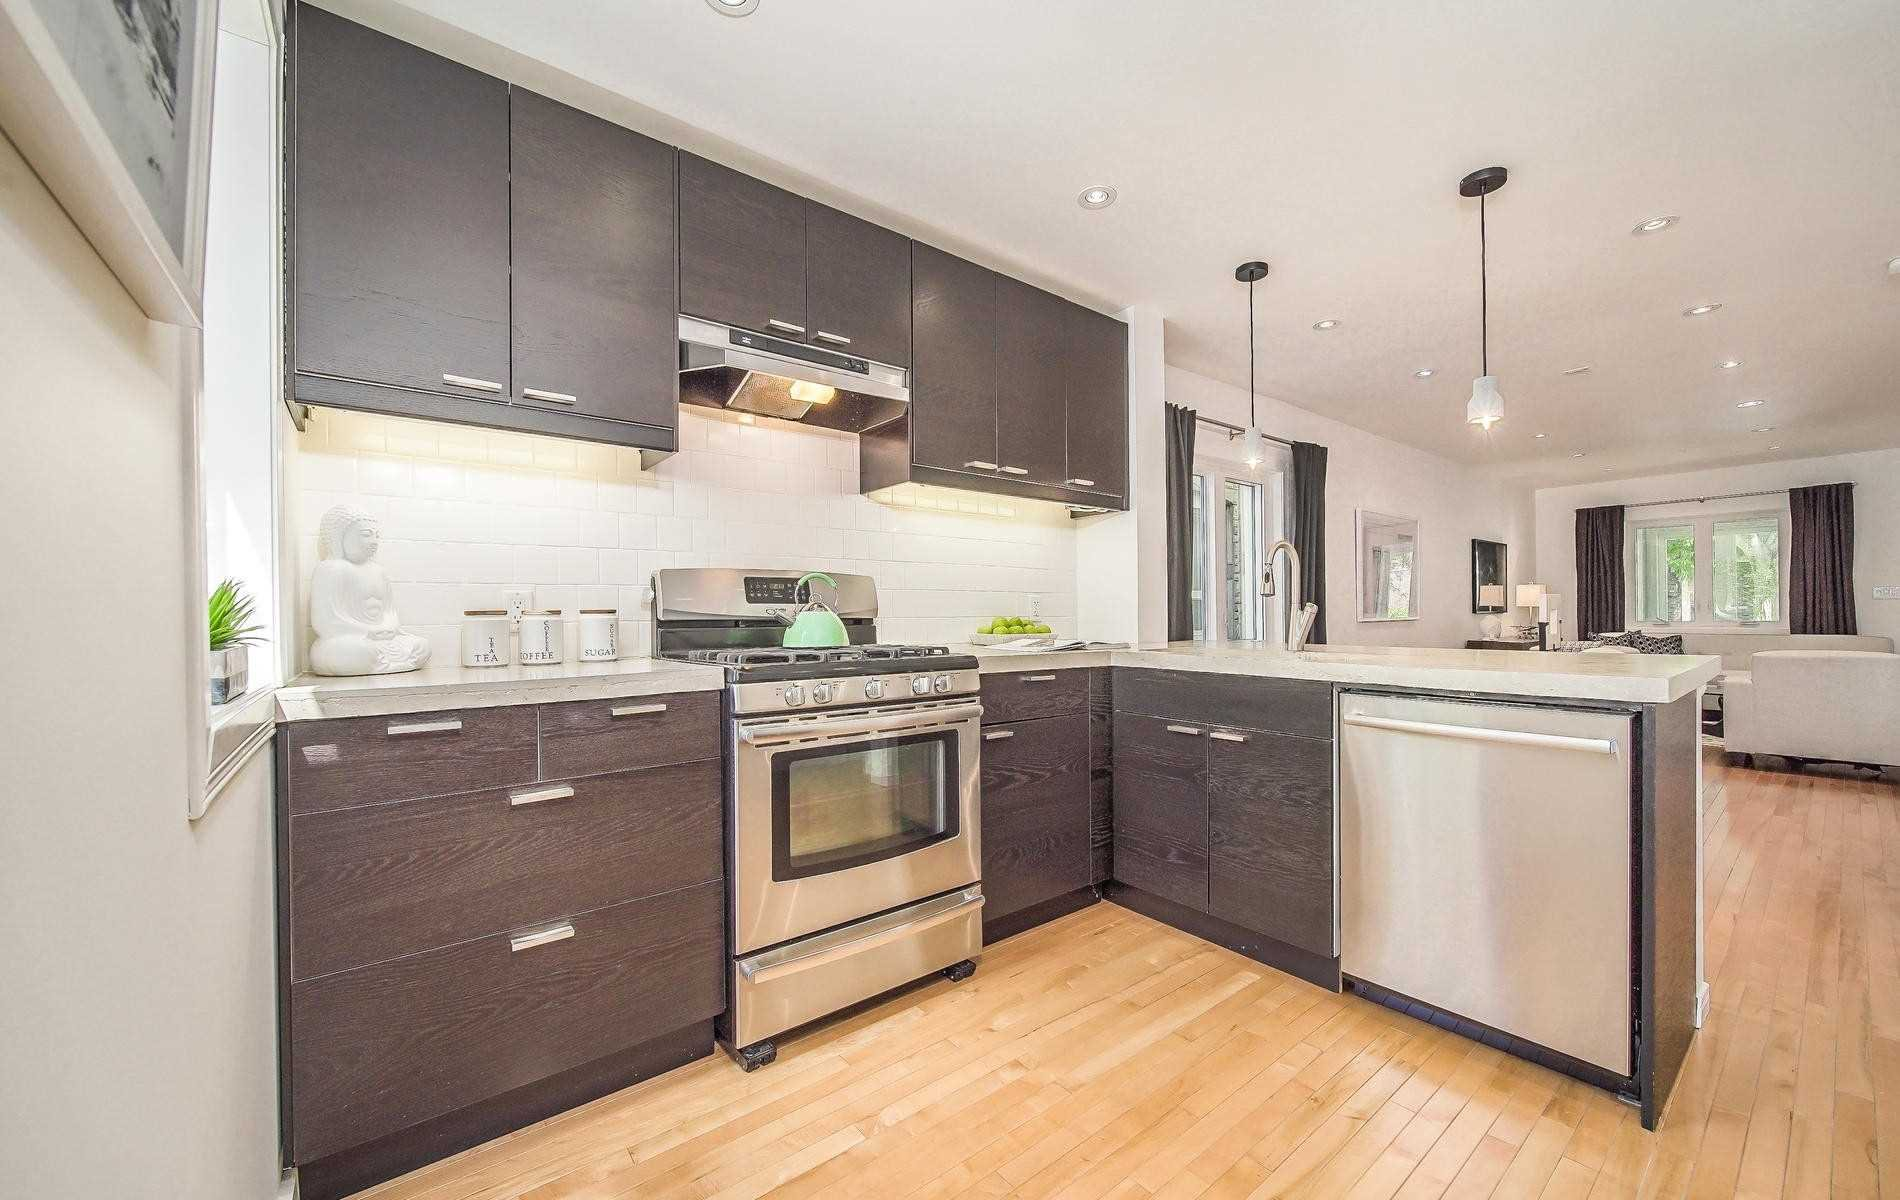 Photo 8: Photos: 64 Larchmount Avenue in Toronto: South Riverdale House (2-Storey) for sale (Toronto E01)  : MLS®# E4489752